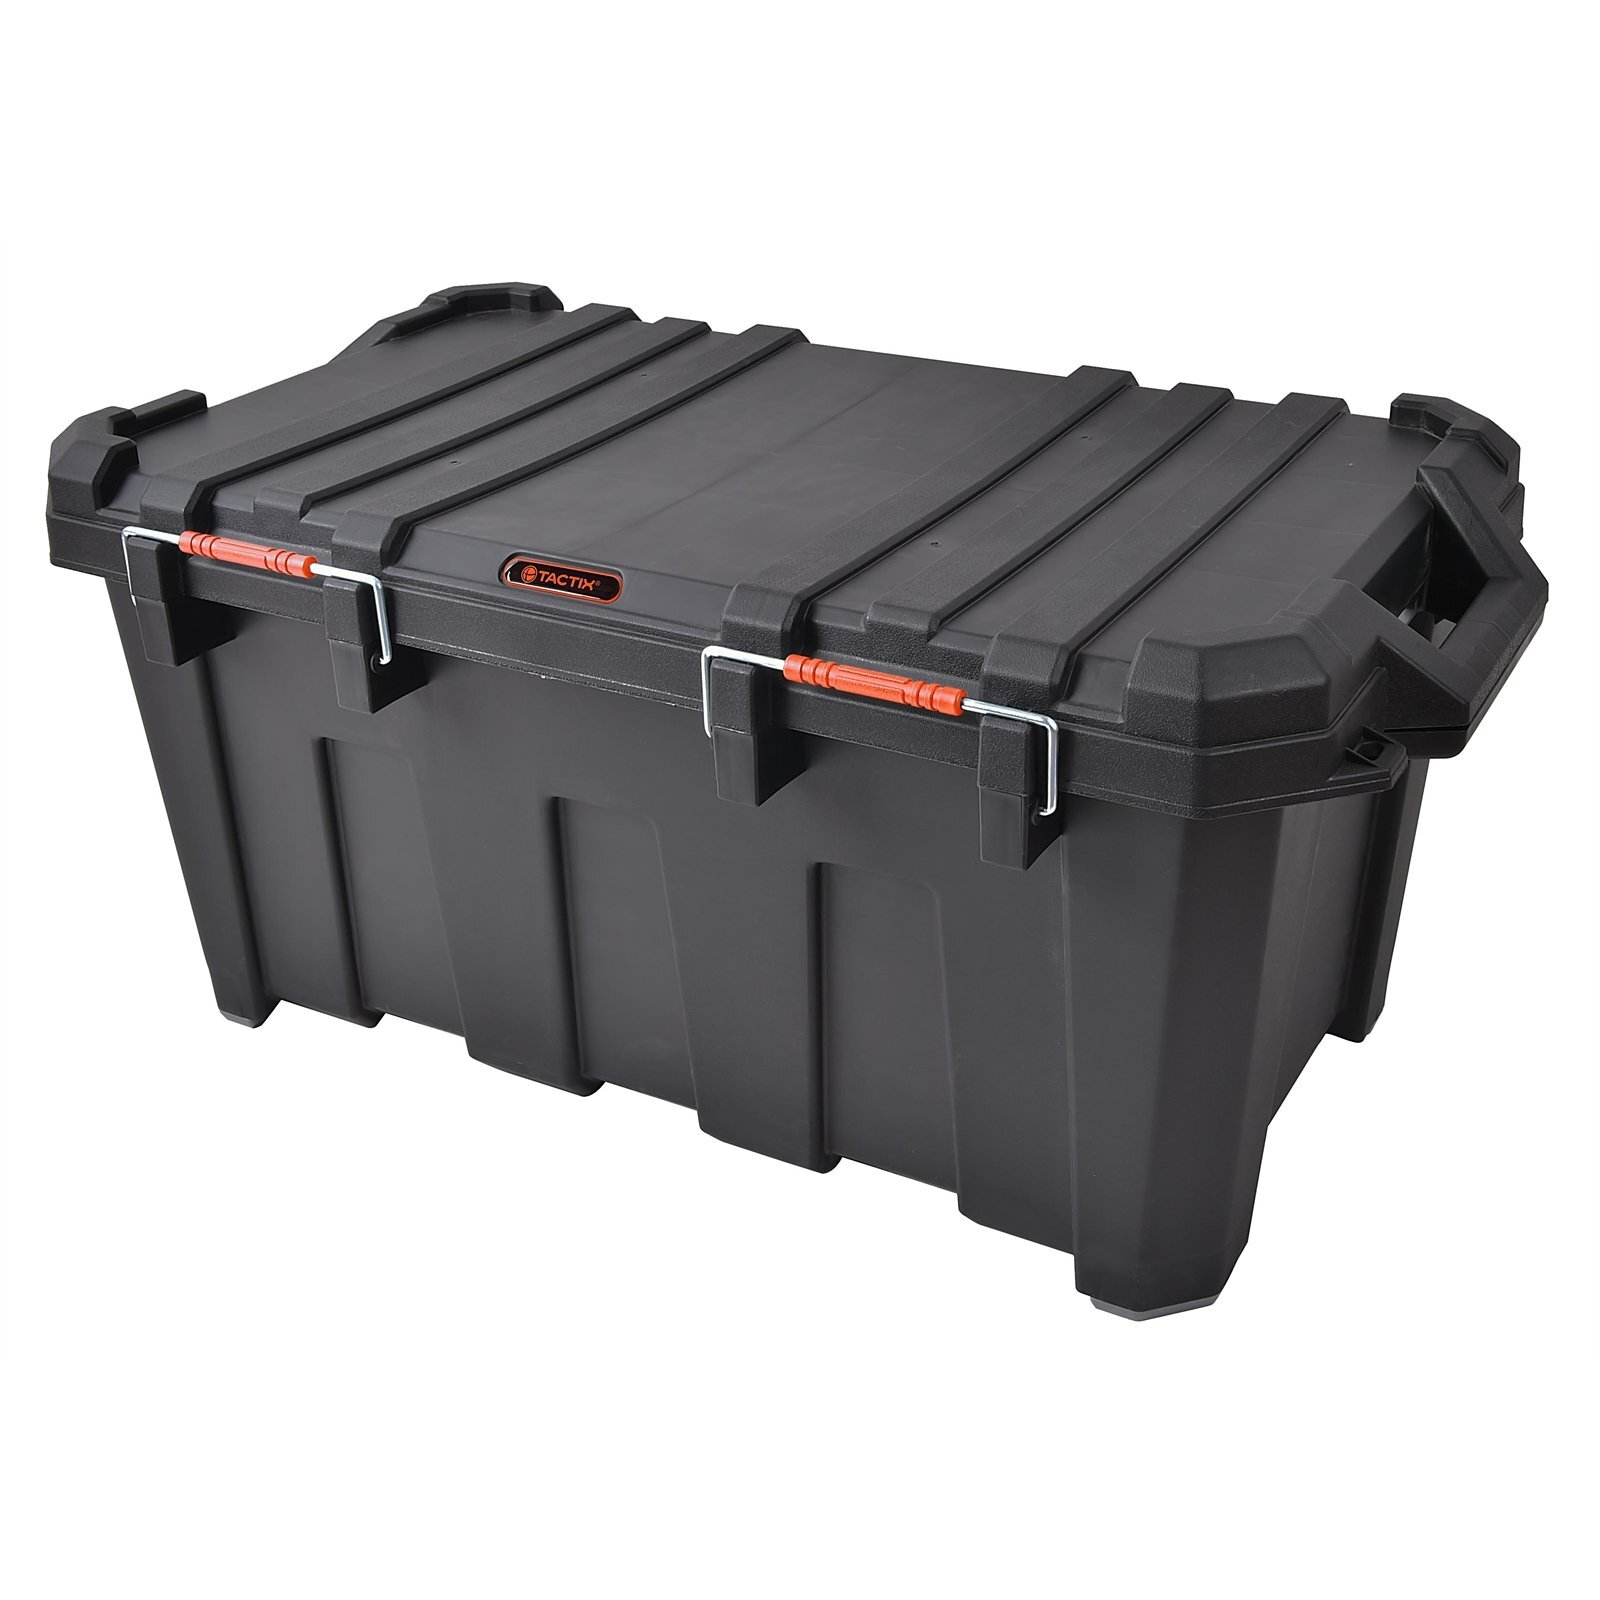 Tactix 85L Heavy Duty Storage Box